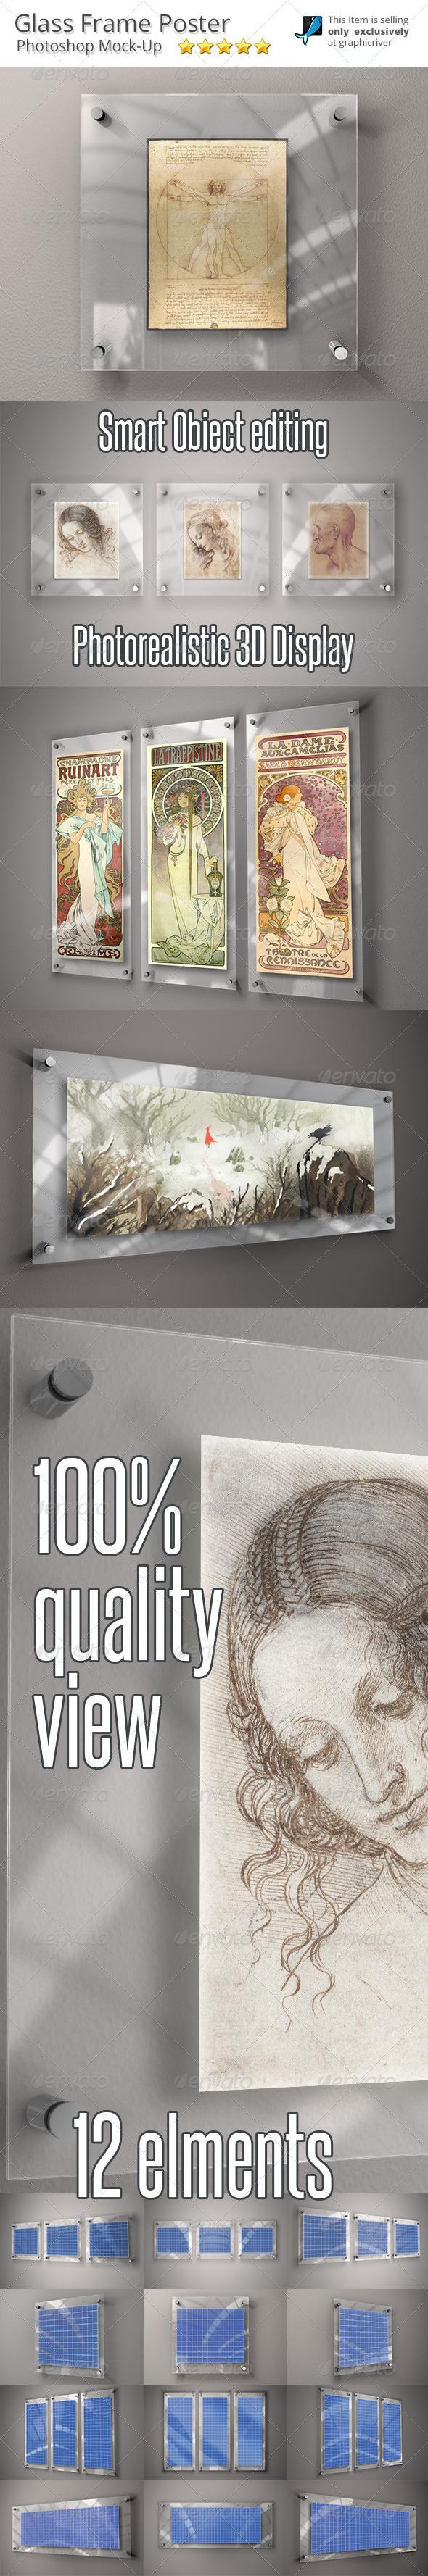 GraphicRiver Glass Frame for Art Mock-Up 6369635